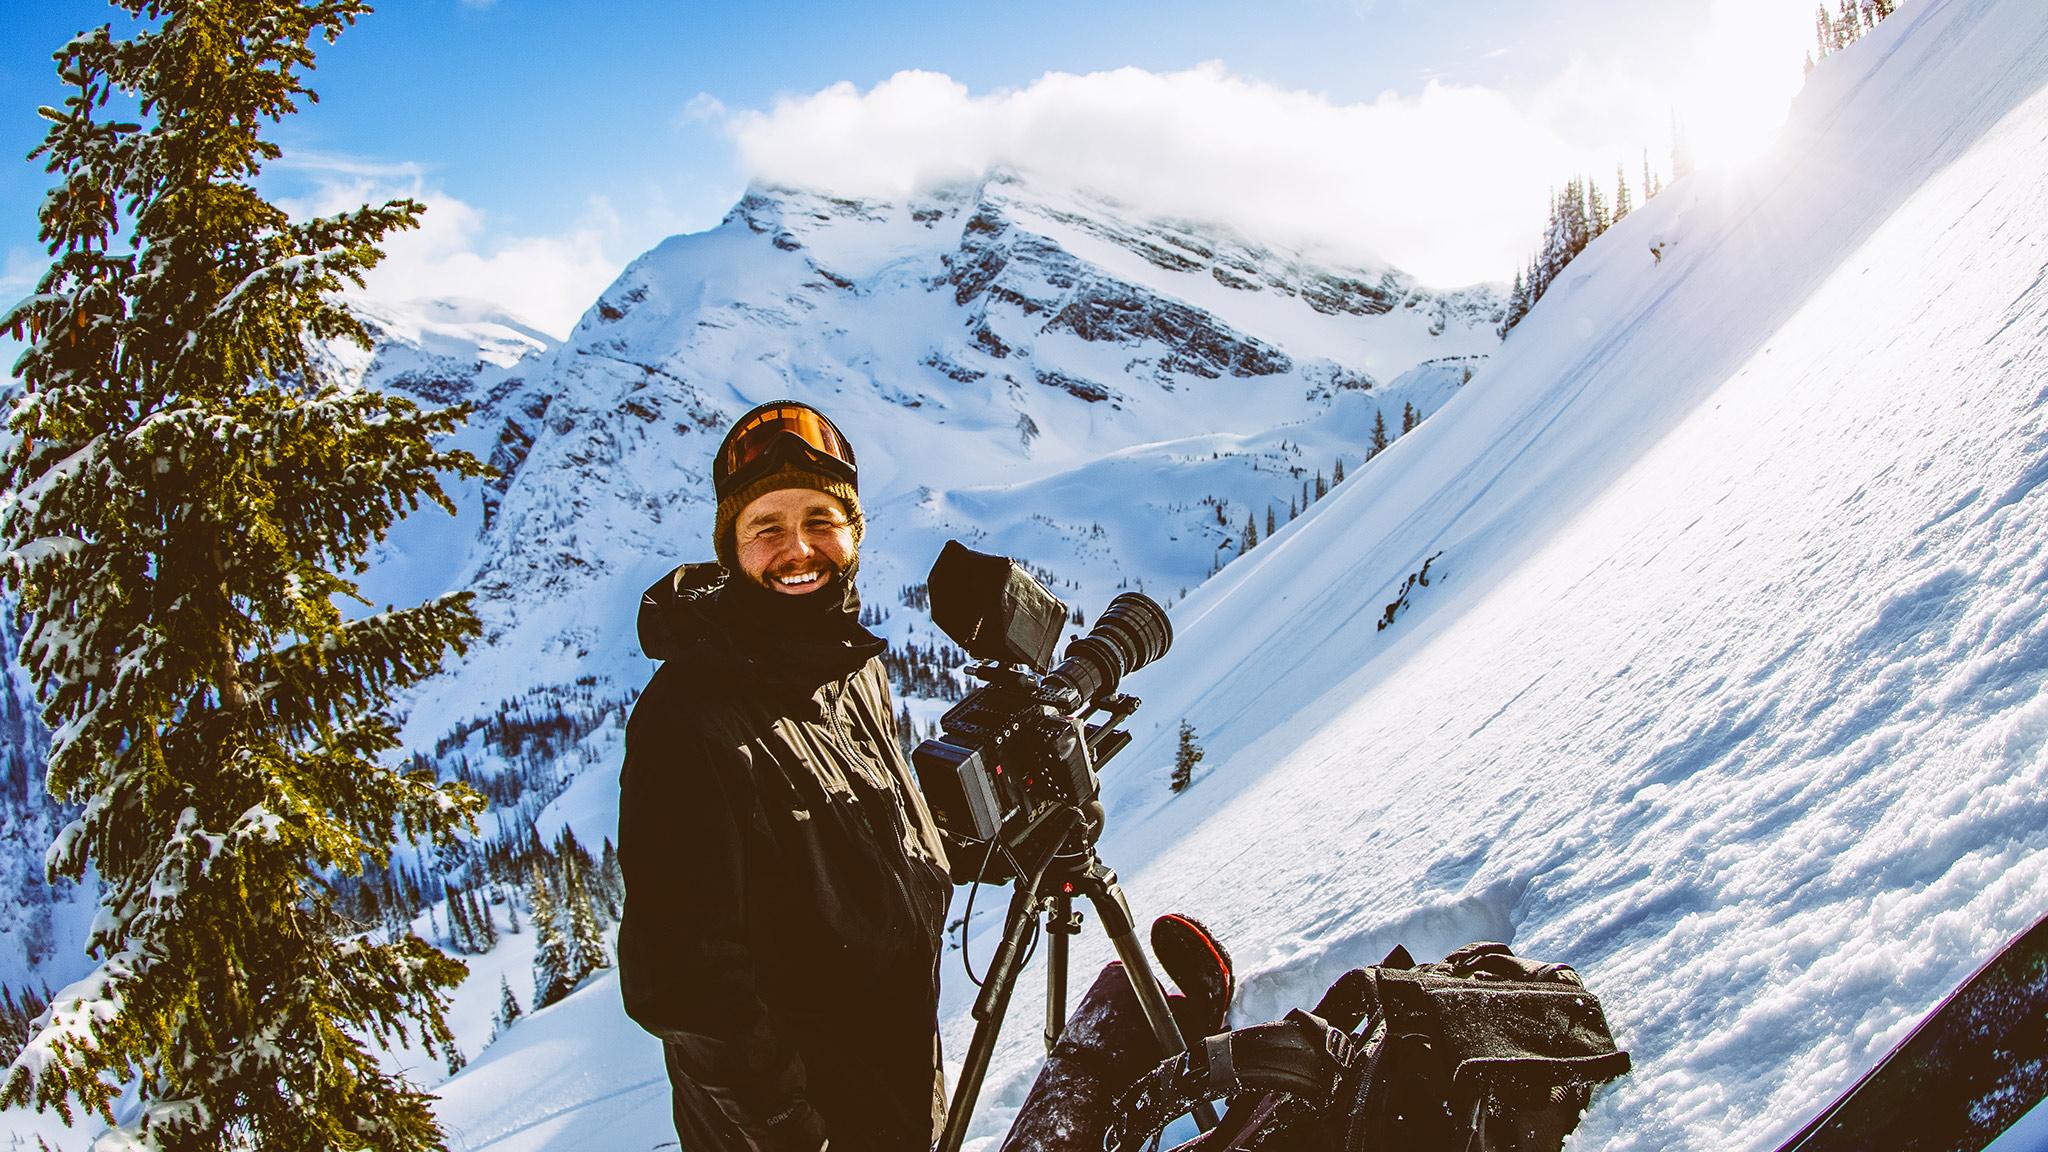 Rencz's filmer: Aaron Leyland